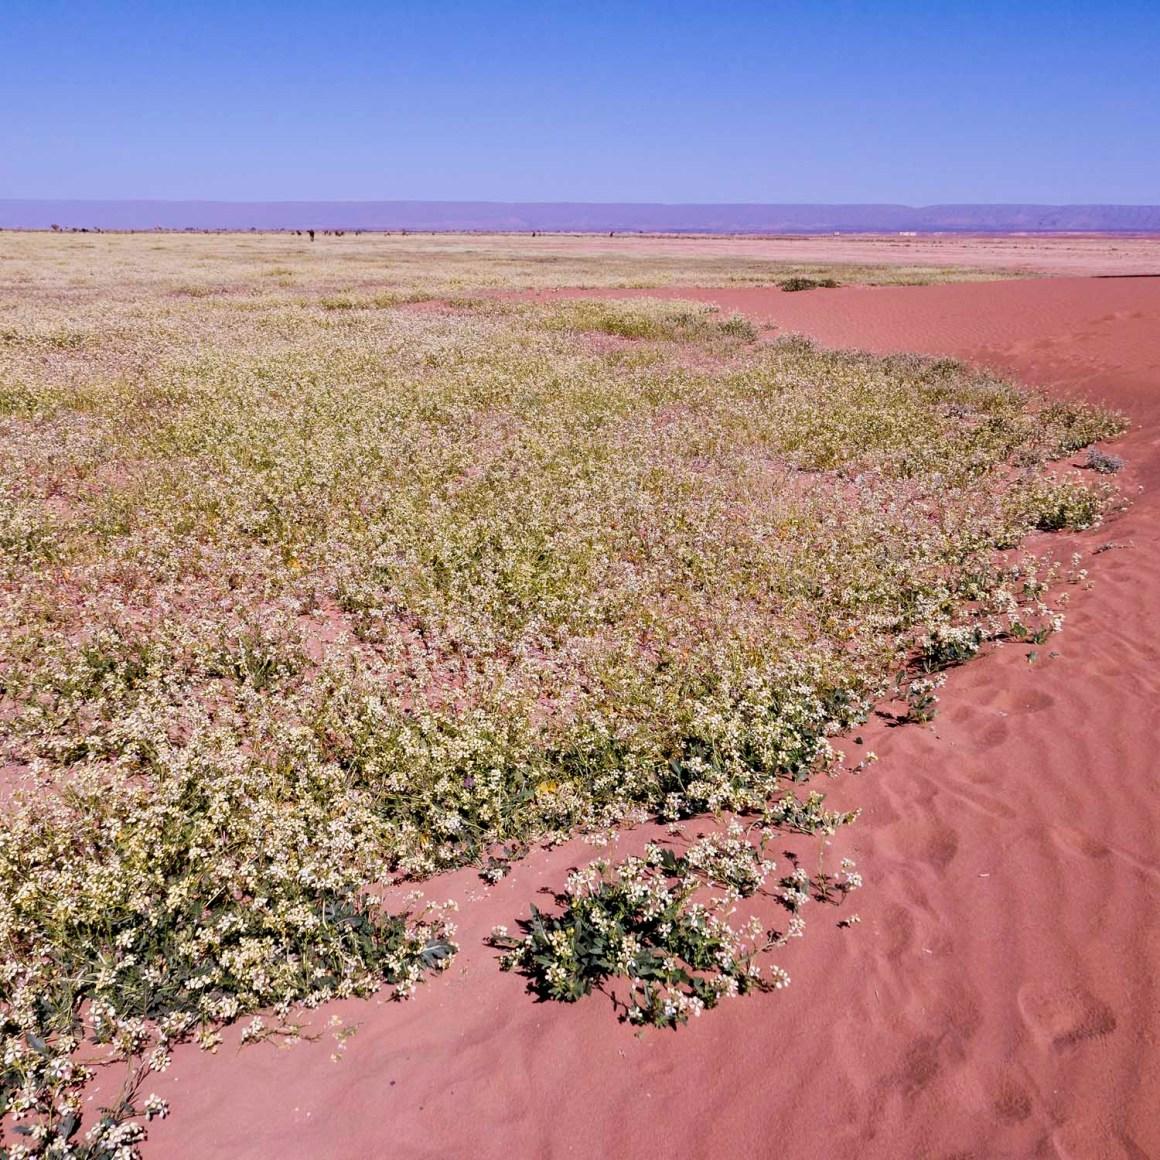 Eclosion printanière, Umnya Dune Camp, Maroc. © Elodie Rothan